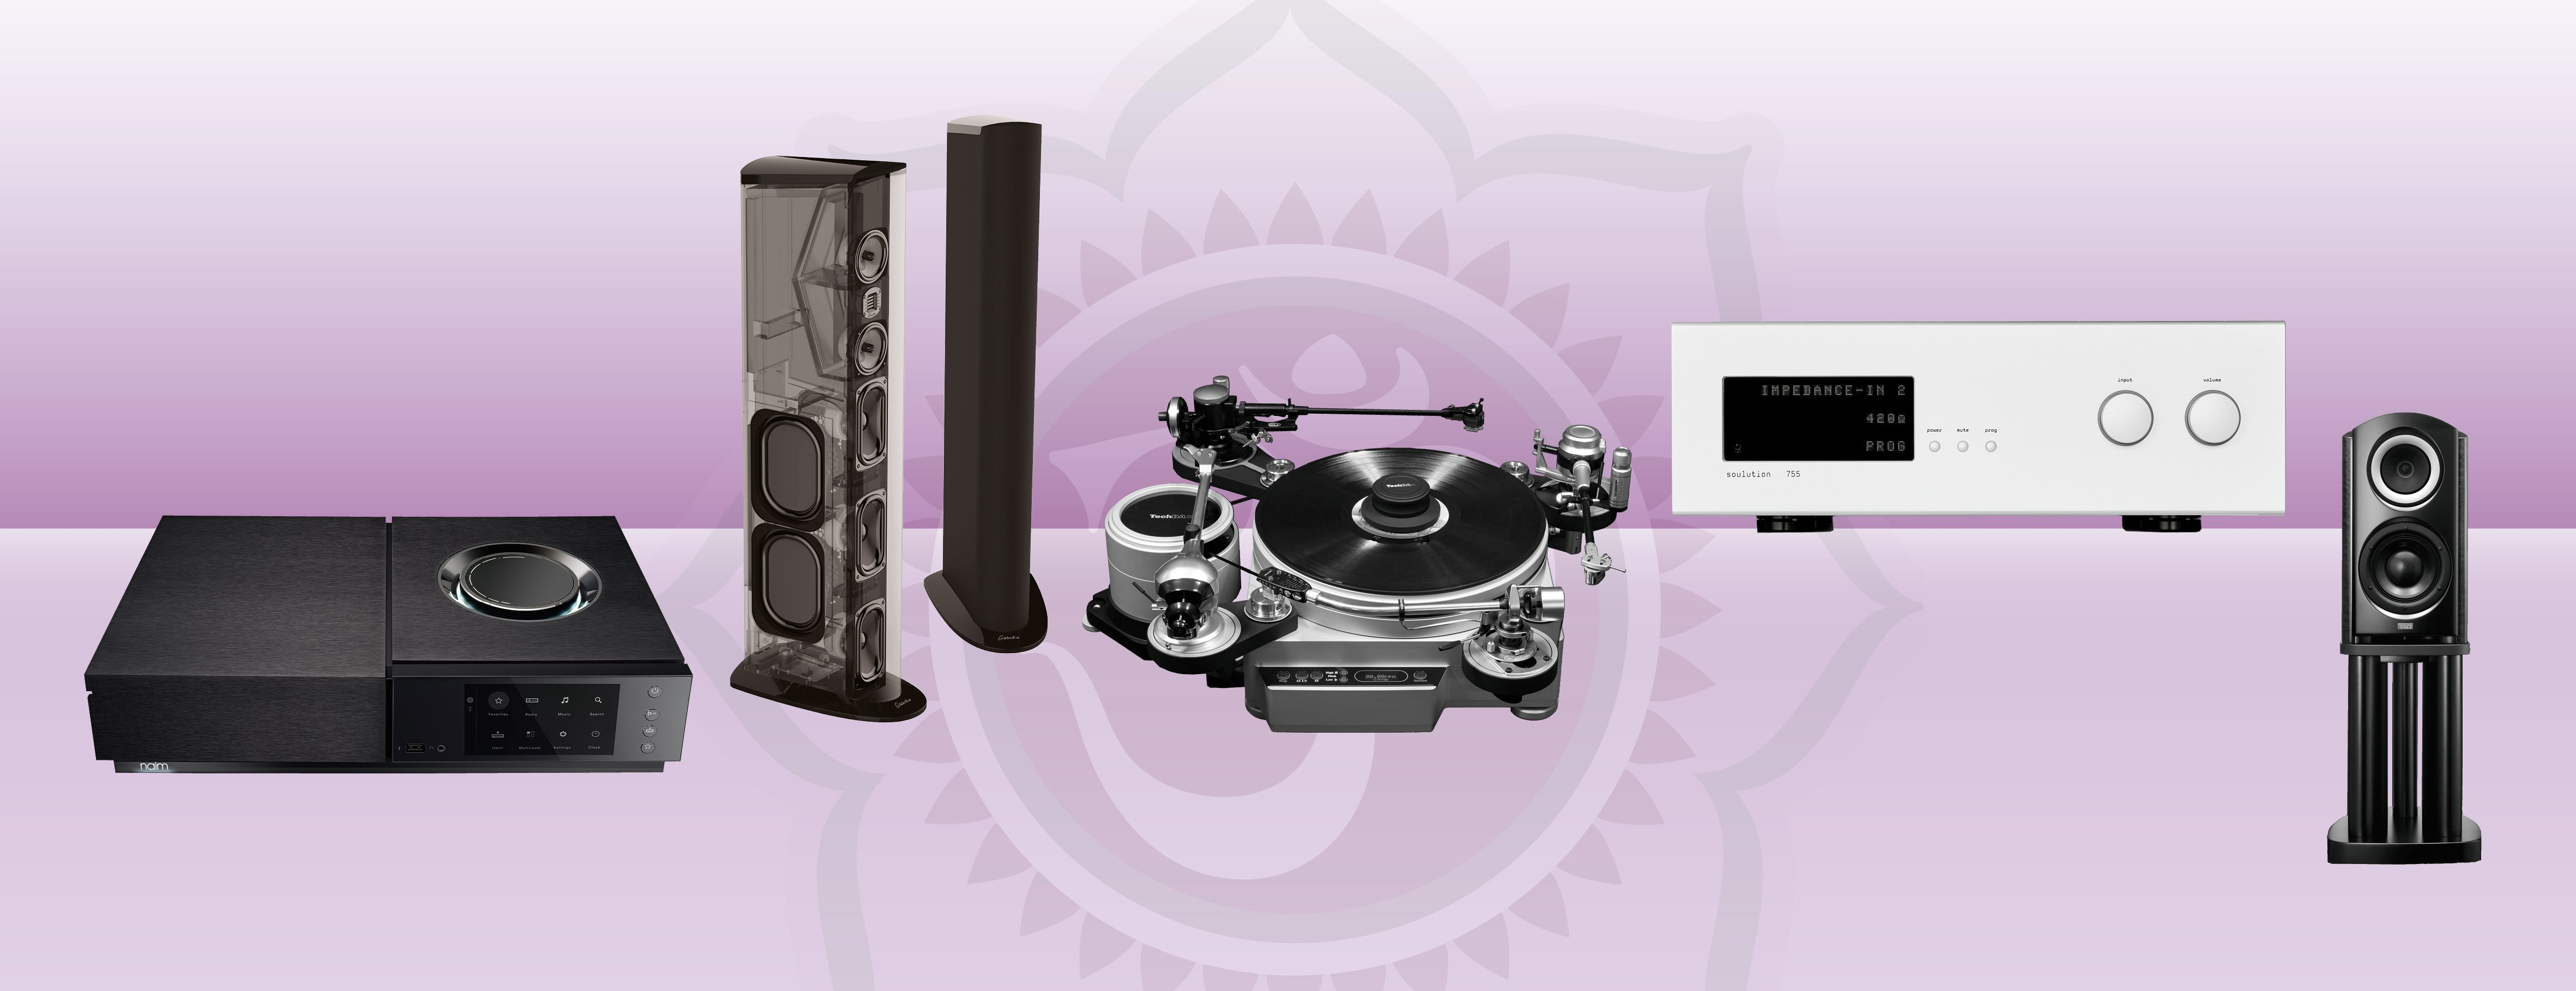 v.l.n.r.: NAIM Uniti Nova, Golden Ear Triton, Techdas AF3, Soulution 755, TAD Micro Evolution